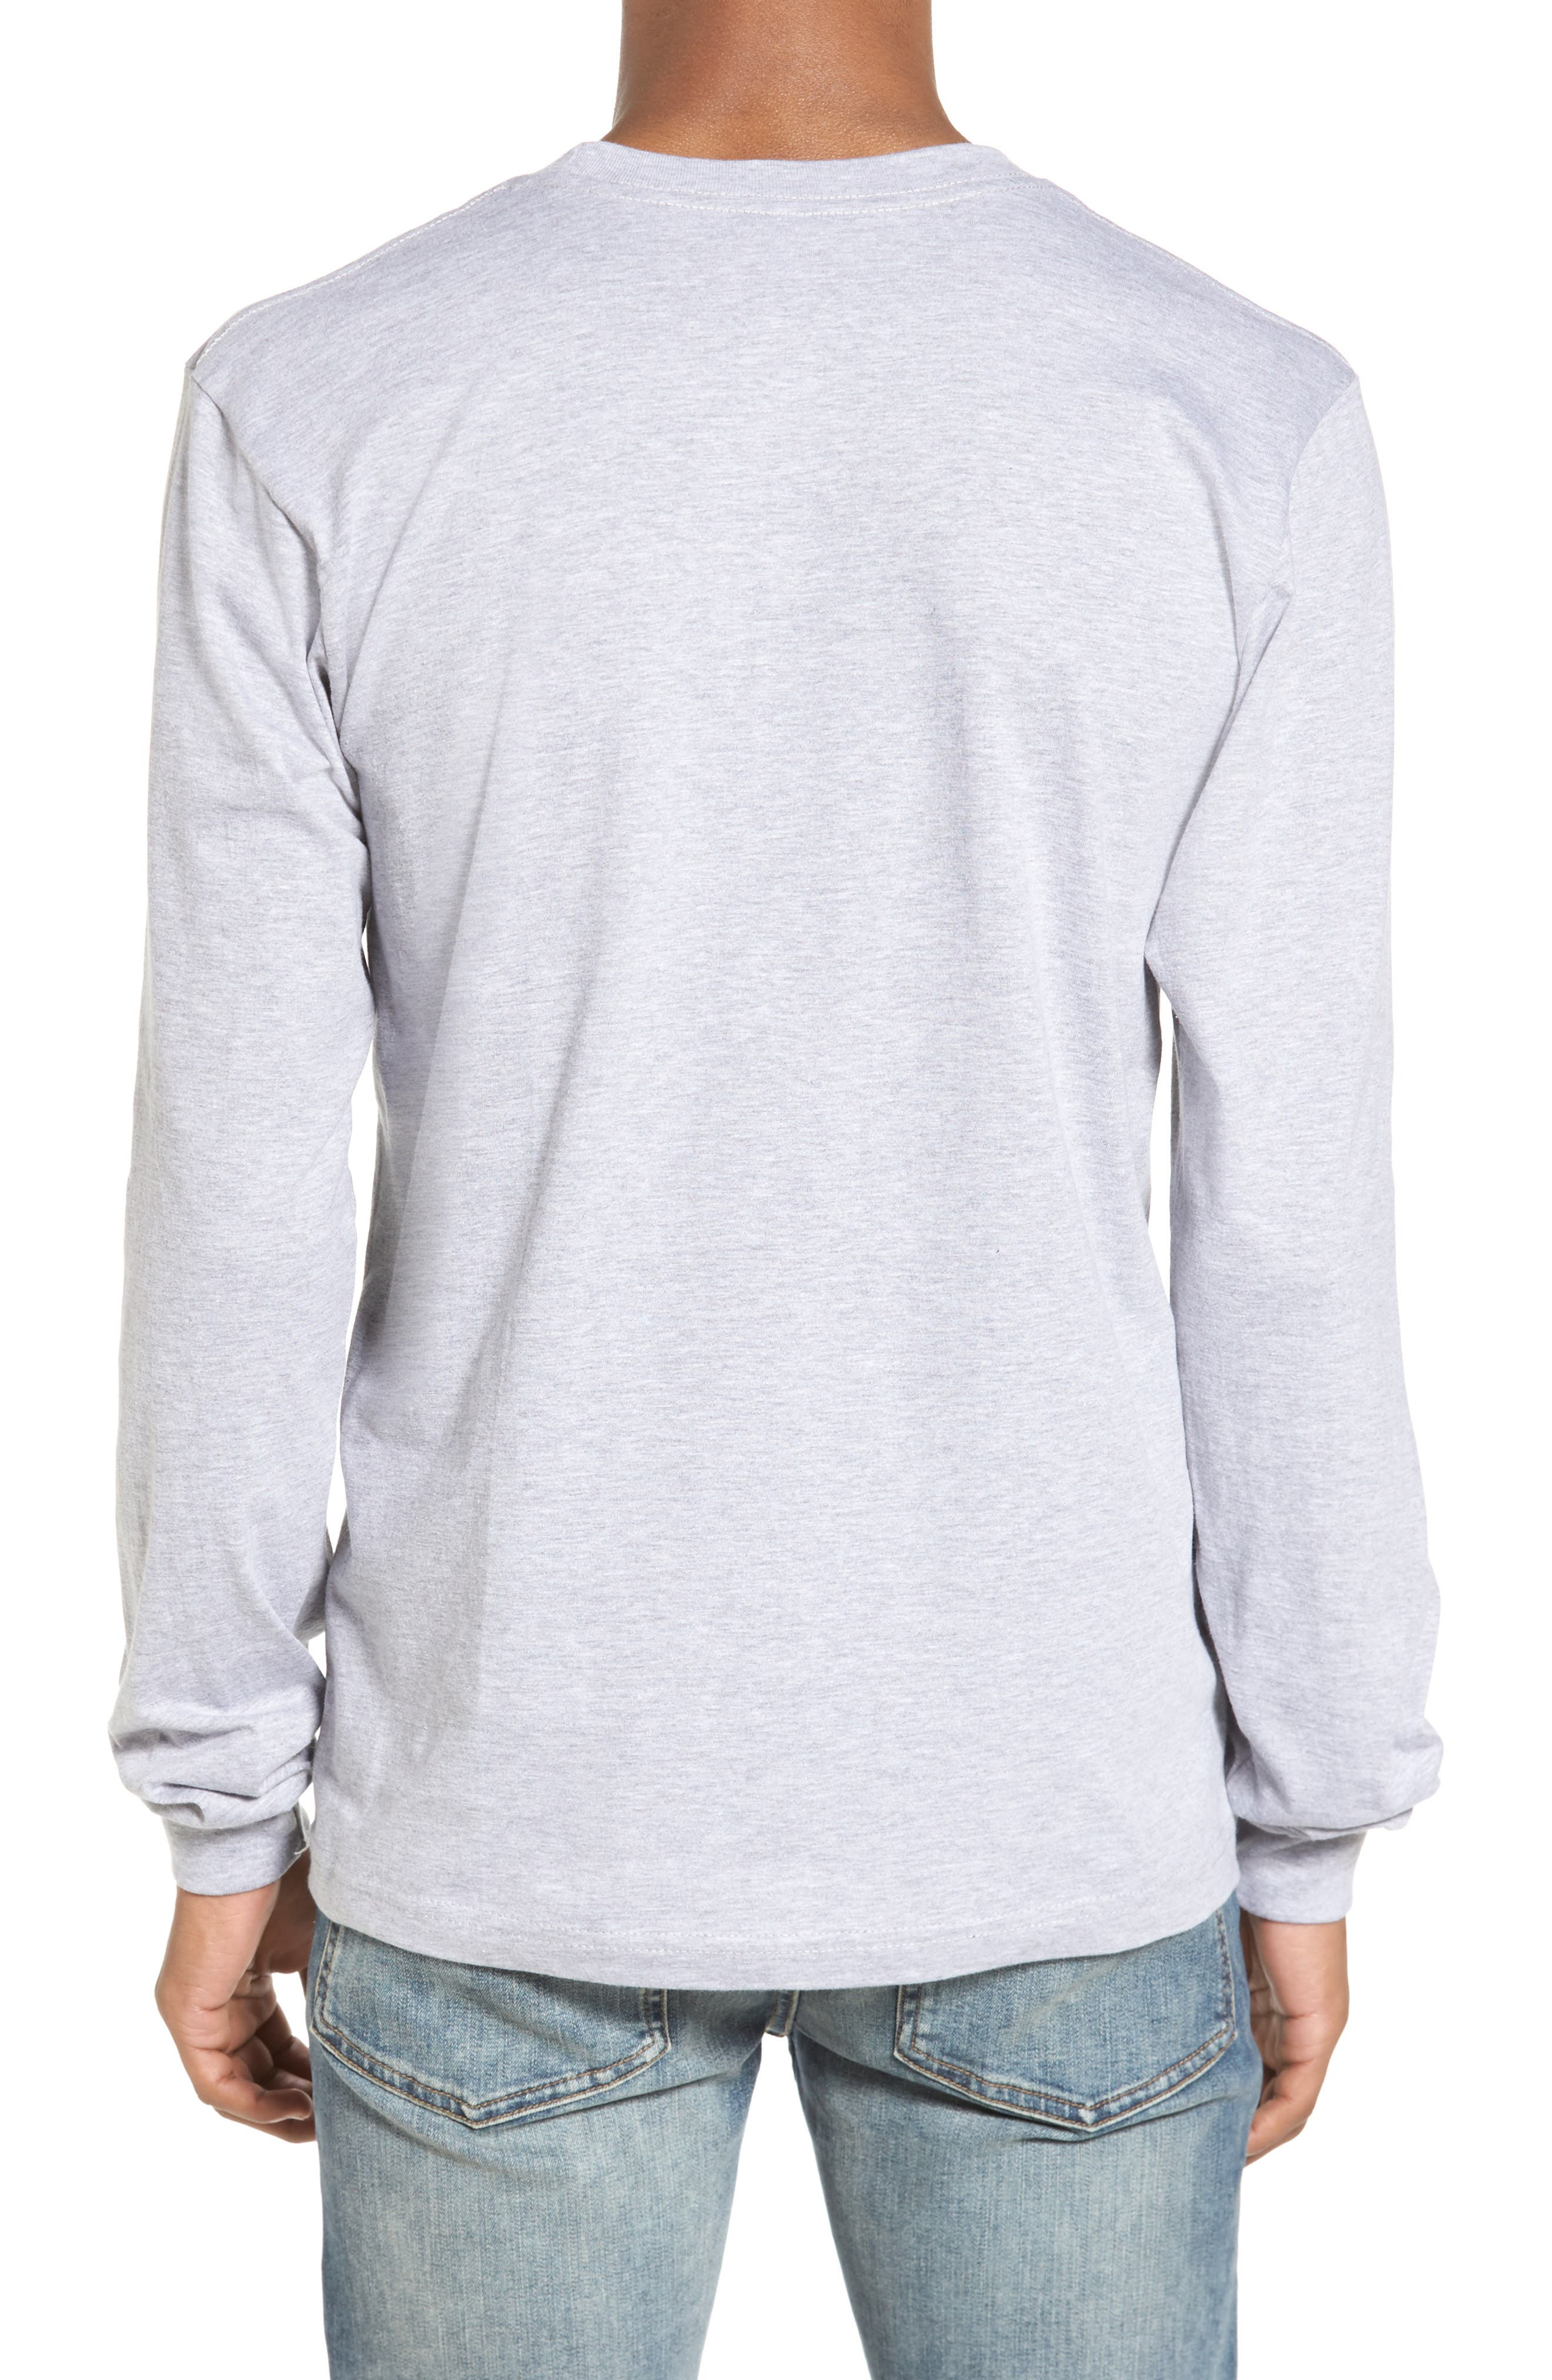 PNW Shield Sweatshirt,                             Alternate thumbnail 2, color,                             Heather Grey